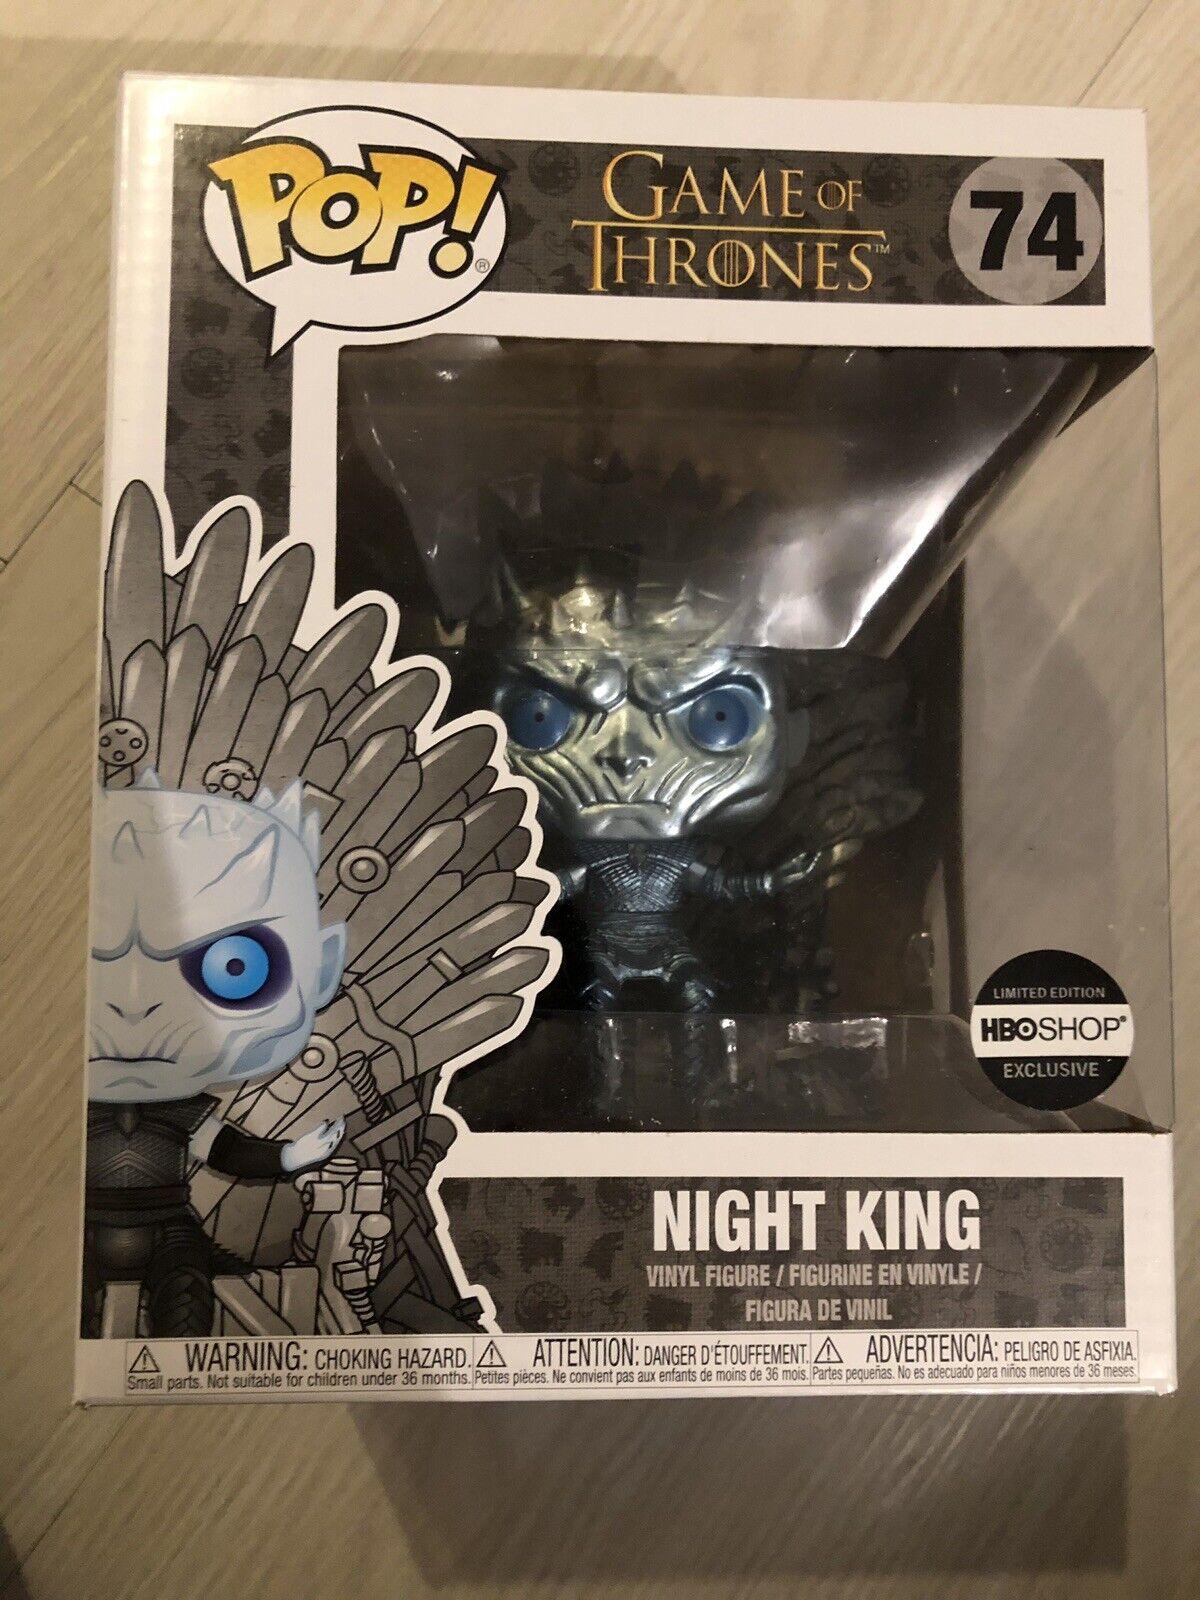 Game of Thrones - Metallic Night King on Throne  74 (HBO Shop) Funko Pop  Vinyl